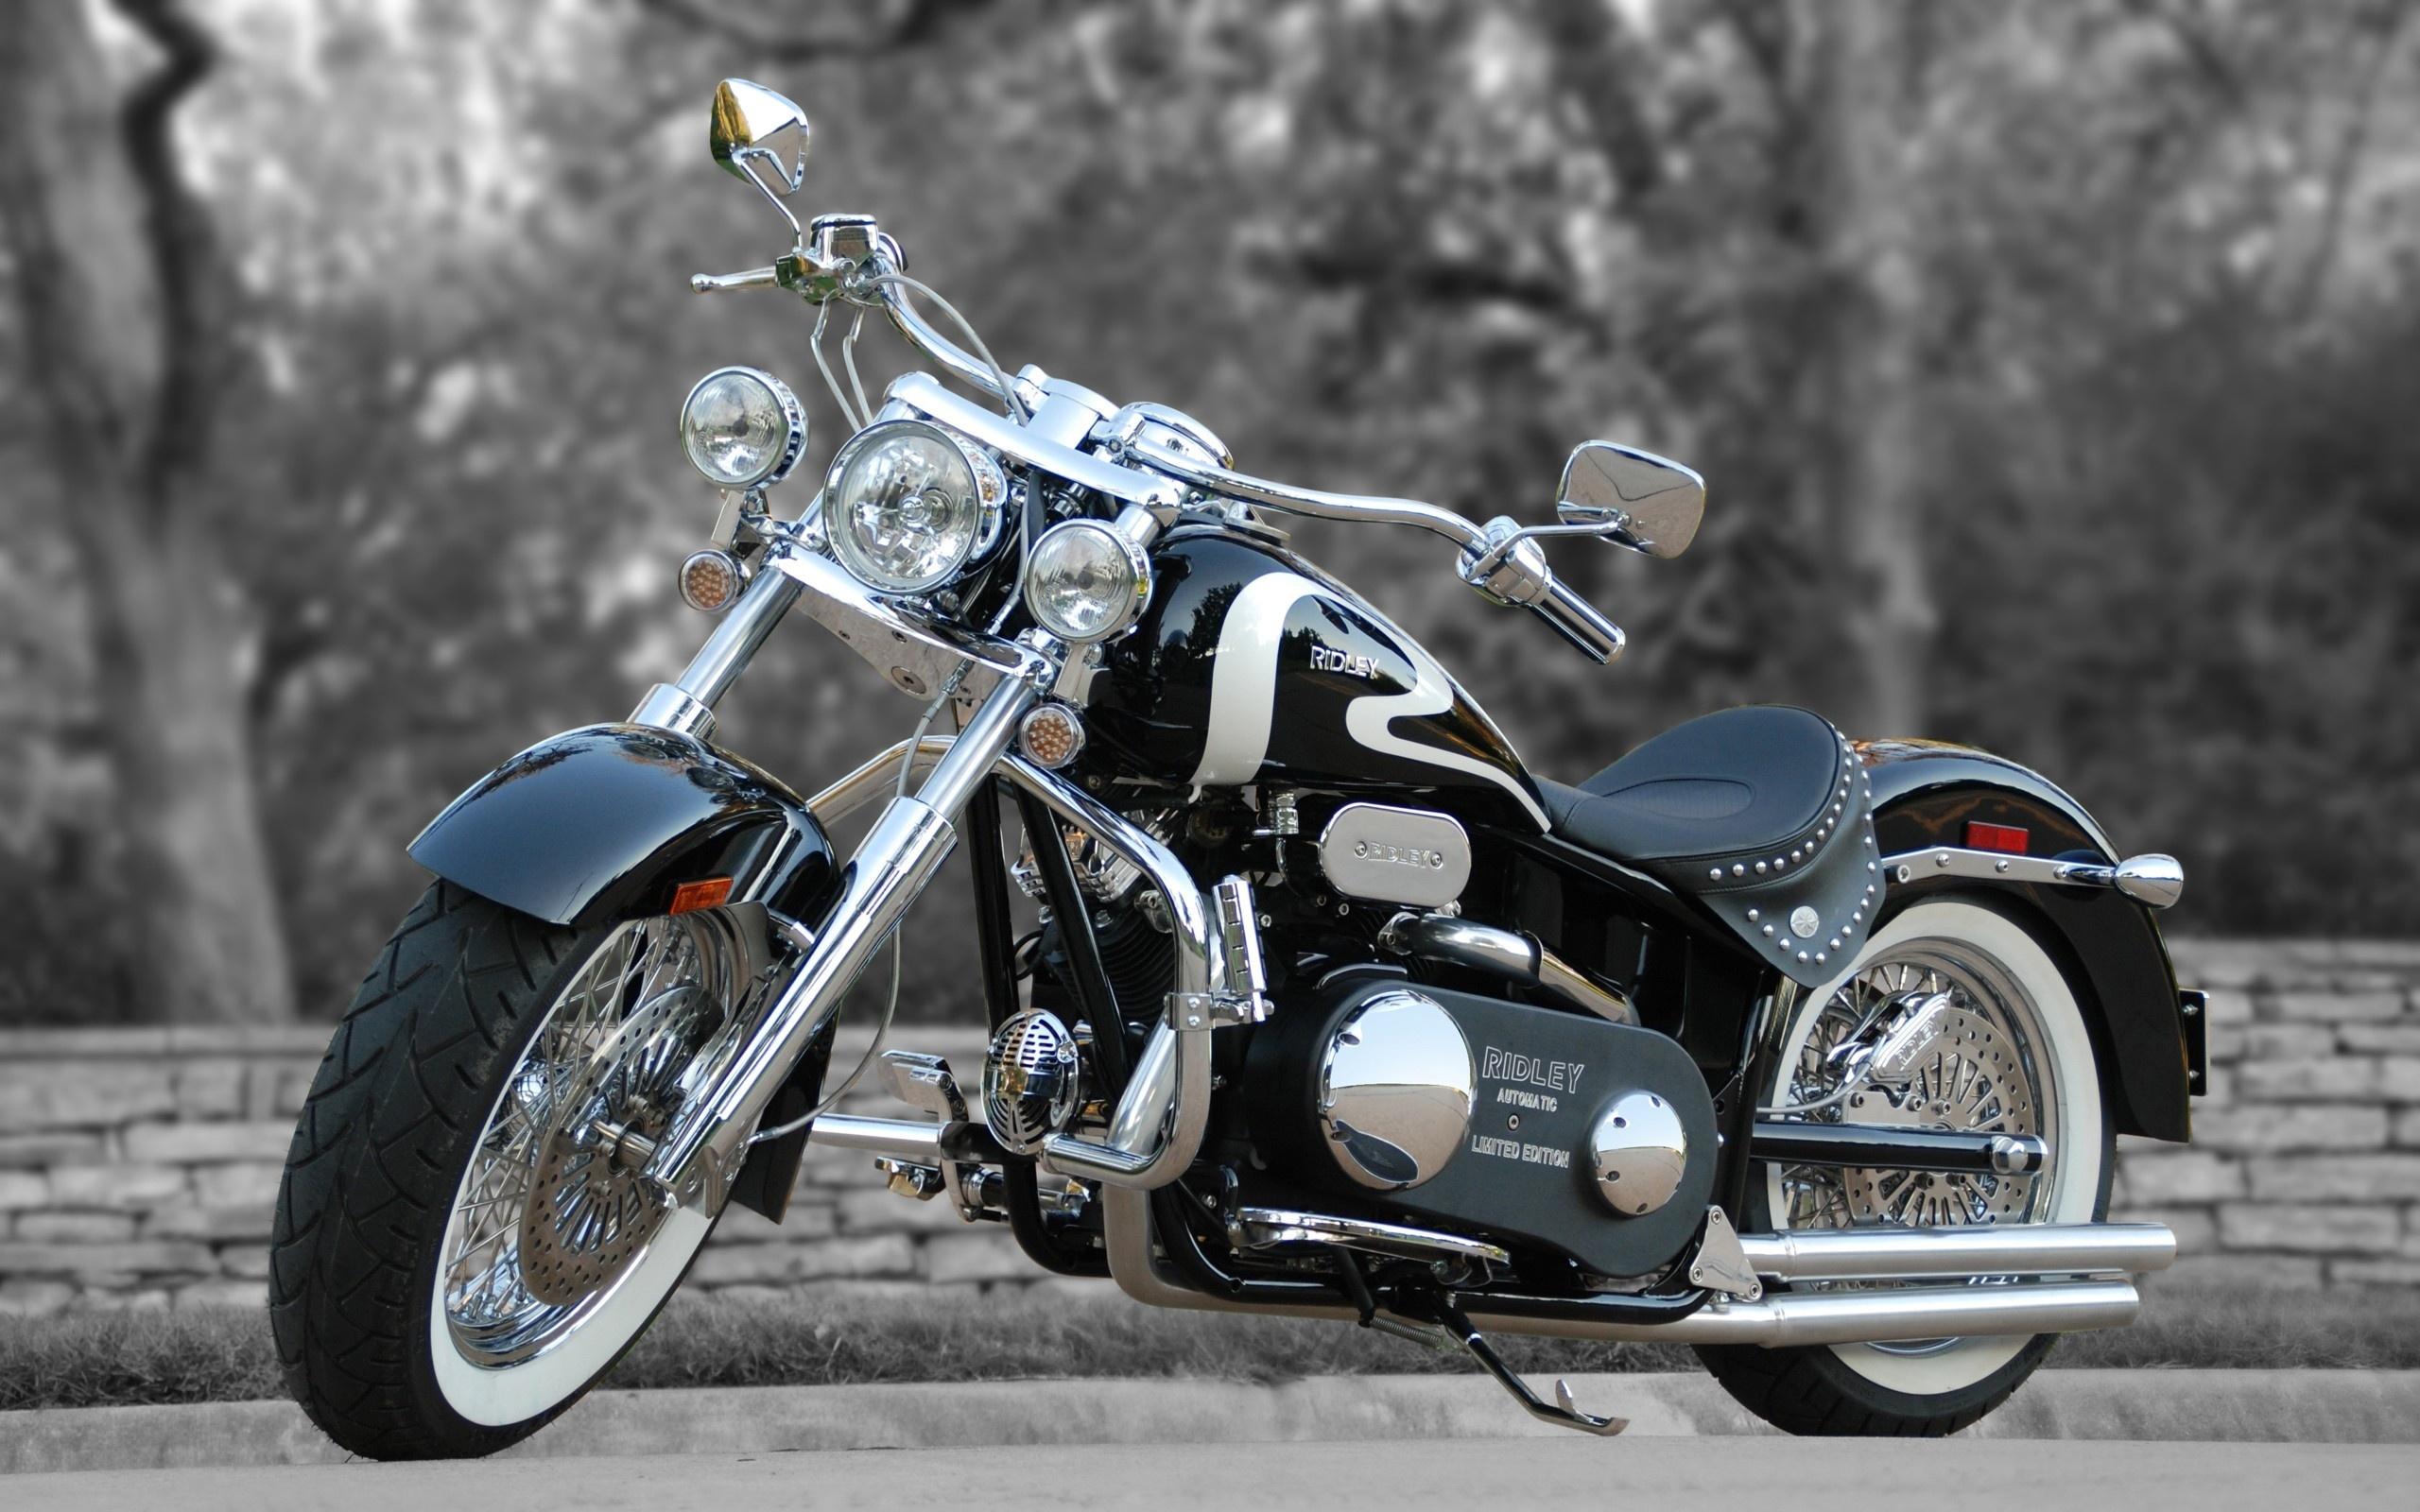 чёрно-серебристый ridley avtomatic limited edition, мотоцикл, байк